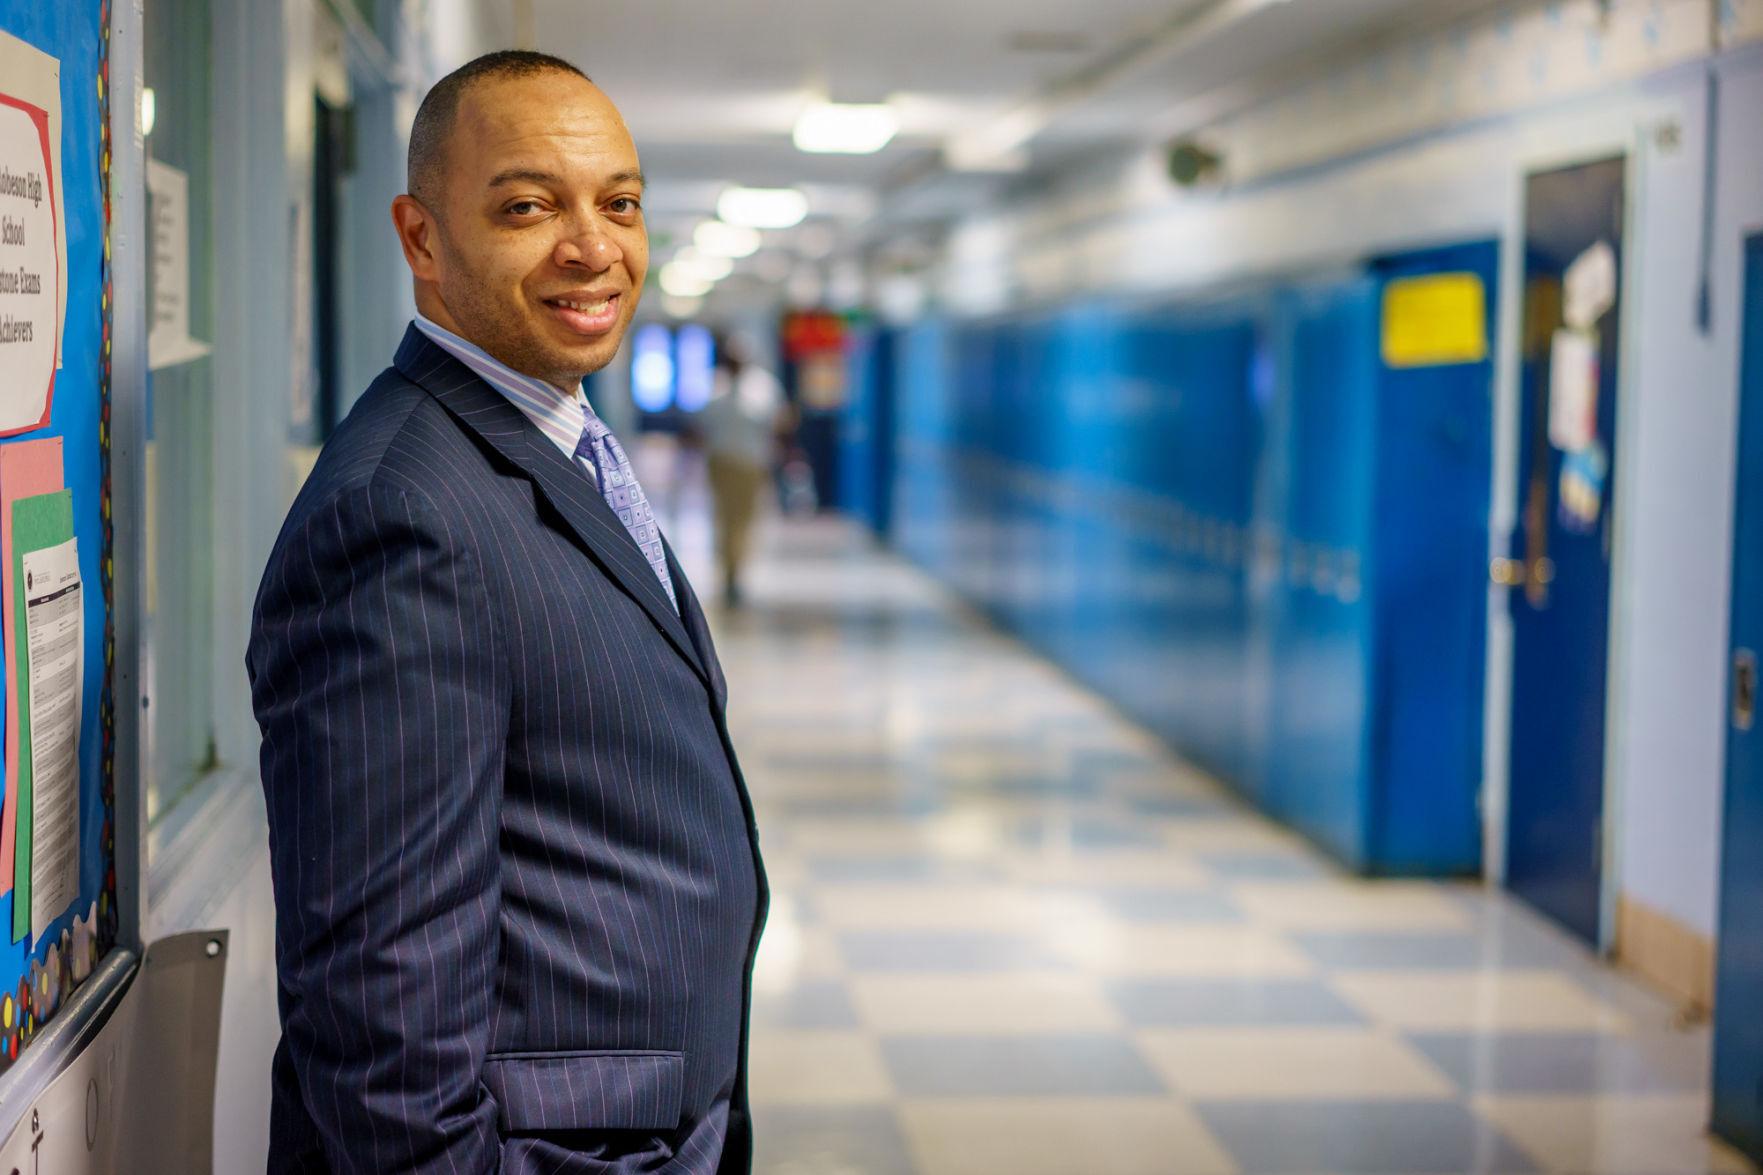 Richard Gordon, principal of Paul Robeson High School, in hallway with lockers